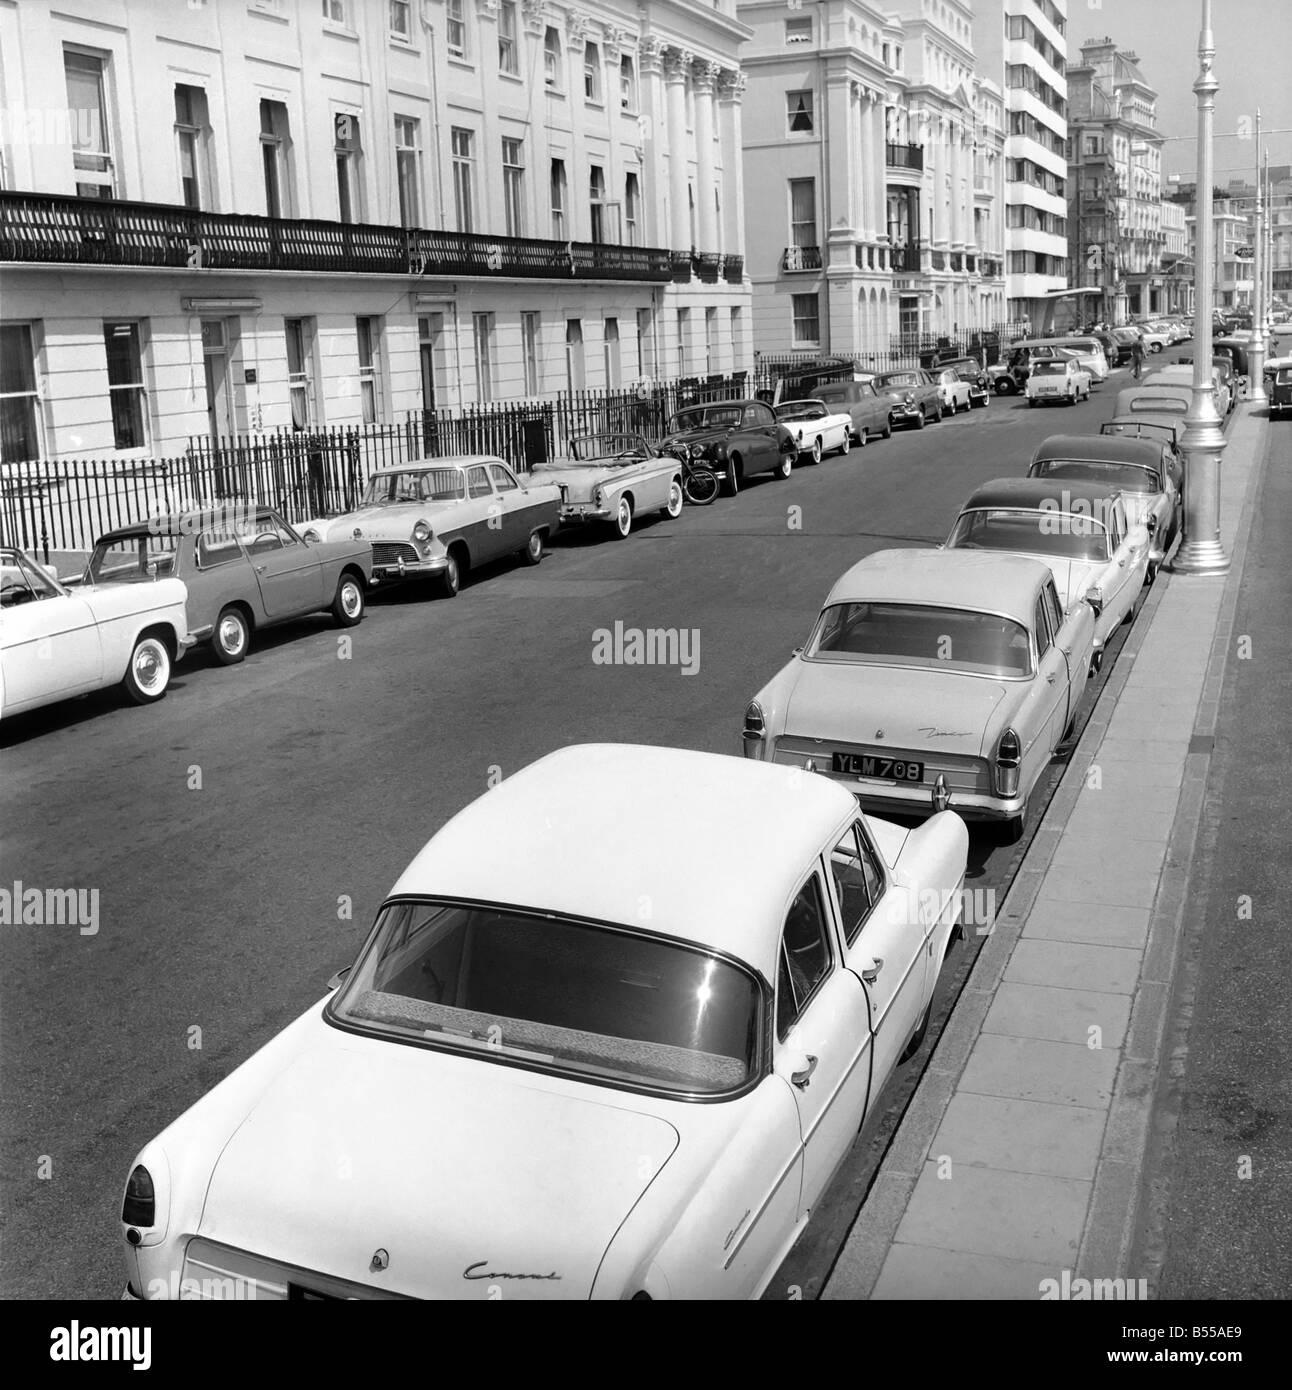 Traffic/Parked cars, street scene. June 1960 M4336-003 - Stock Image